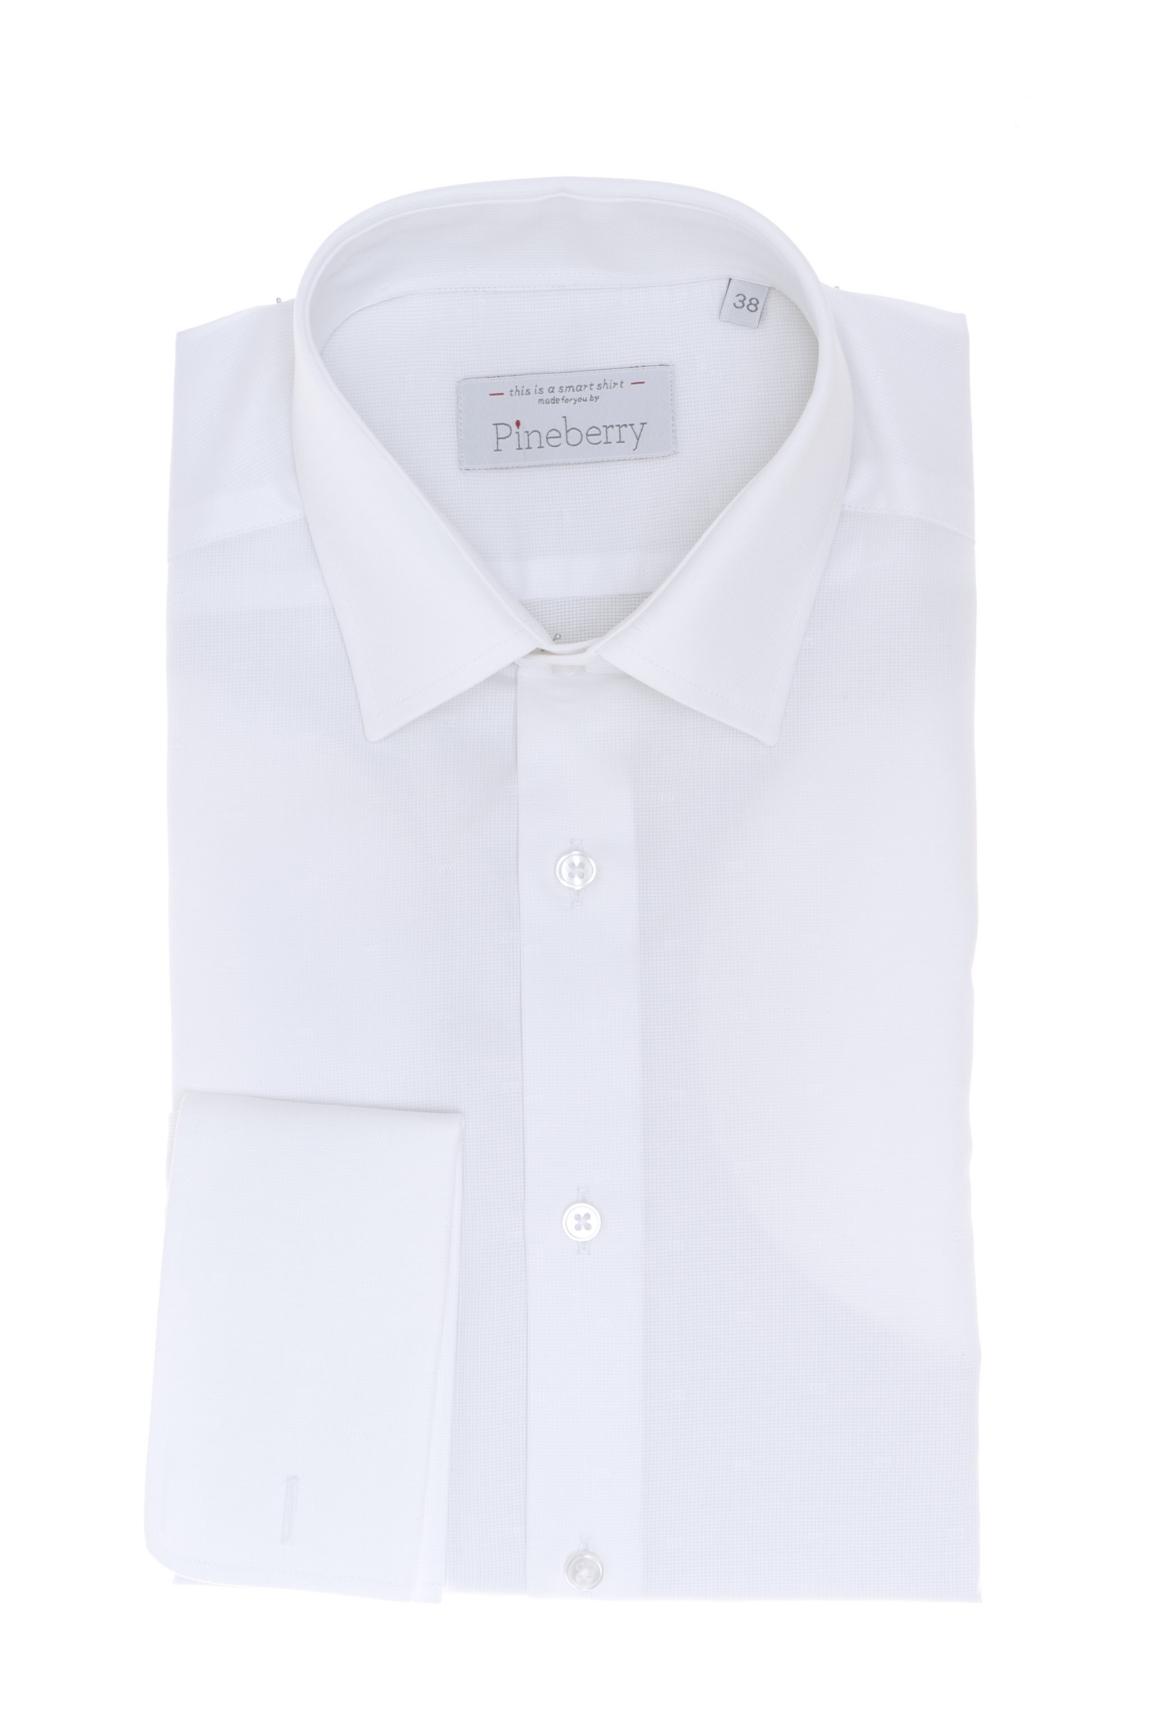 Camasa barbati eleganta pentru butoni